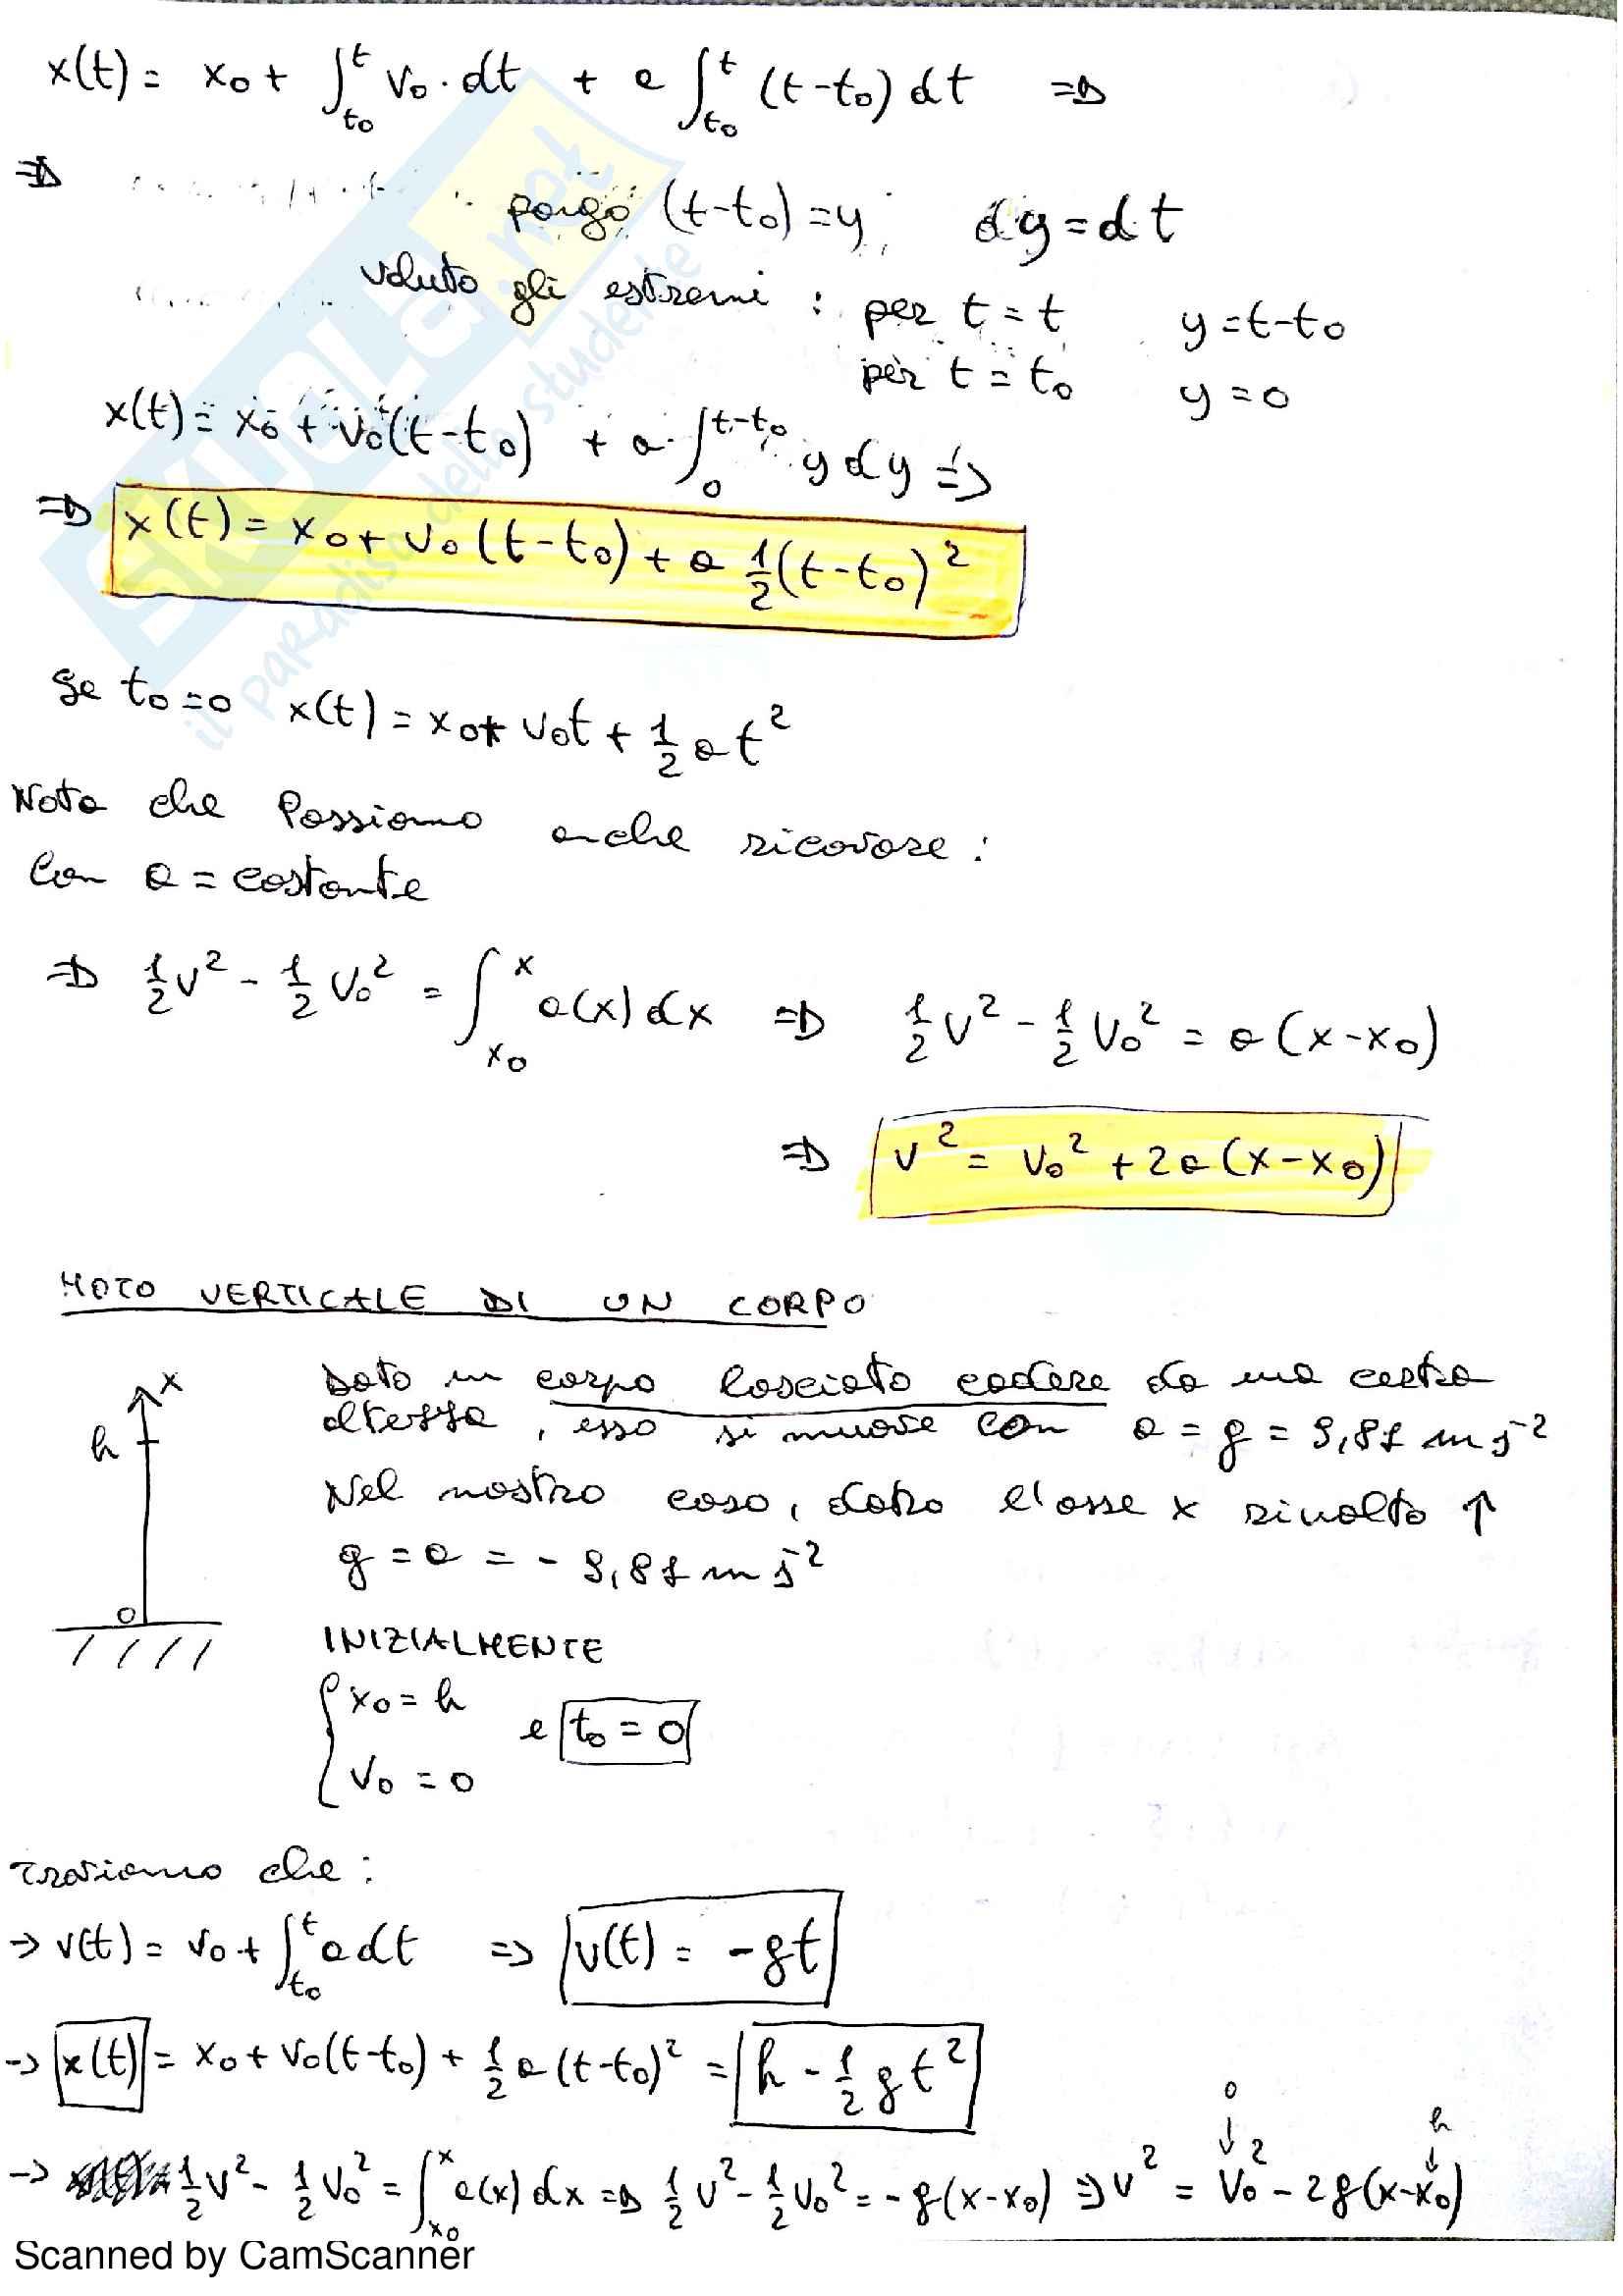 Fisica 1 , Ghigo Gianluca, Appunti + QUIZ Esame + Temi Esame (Polito) Pag. 6